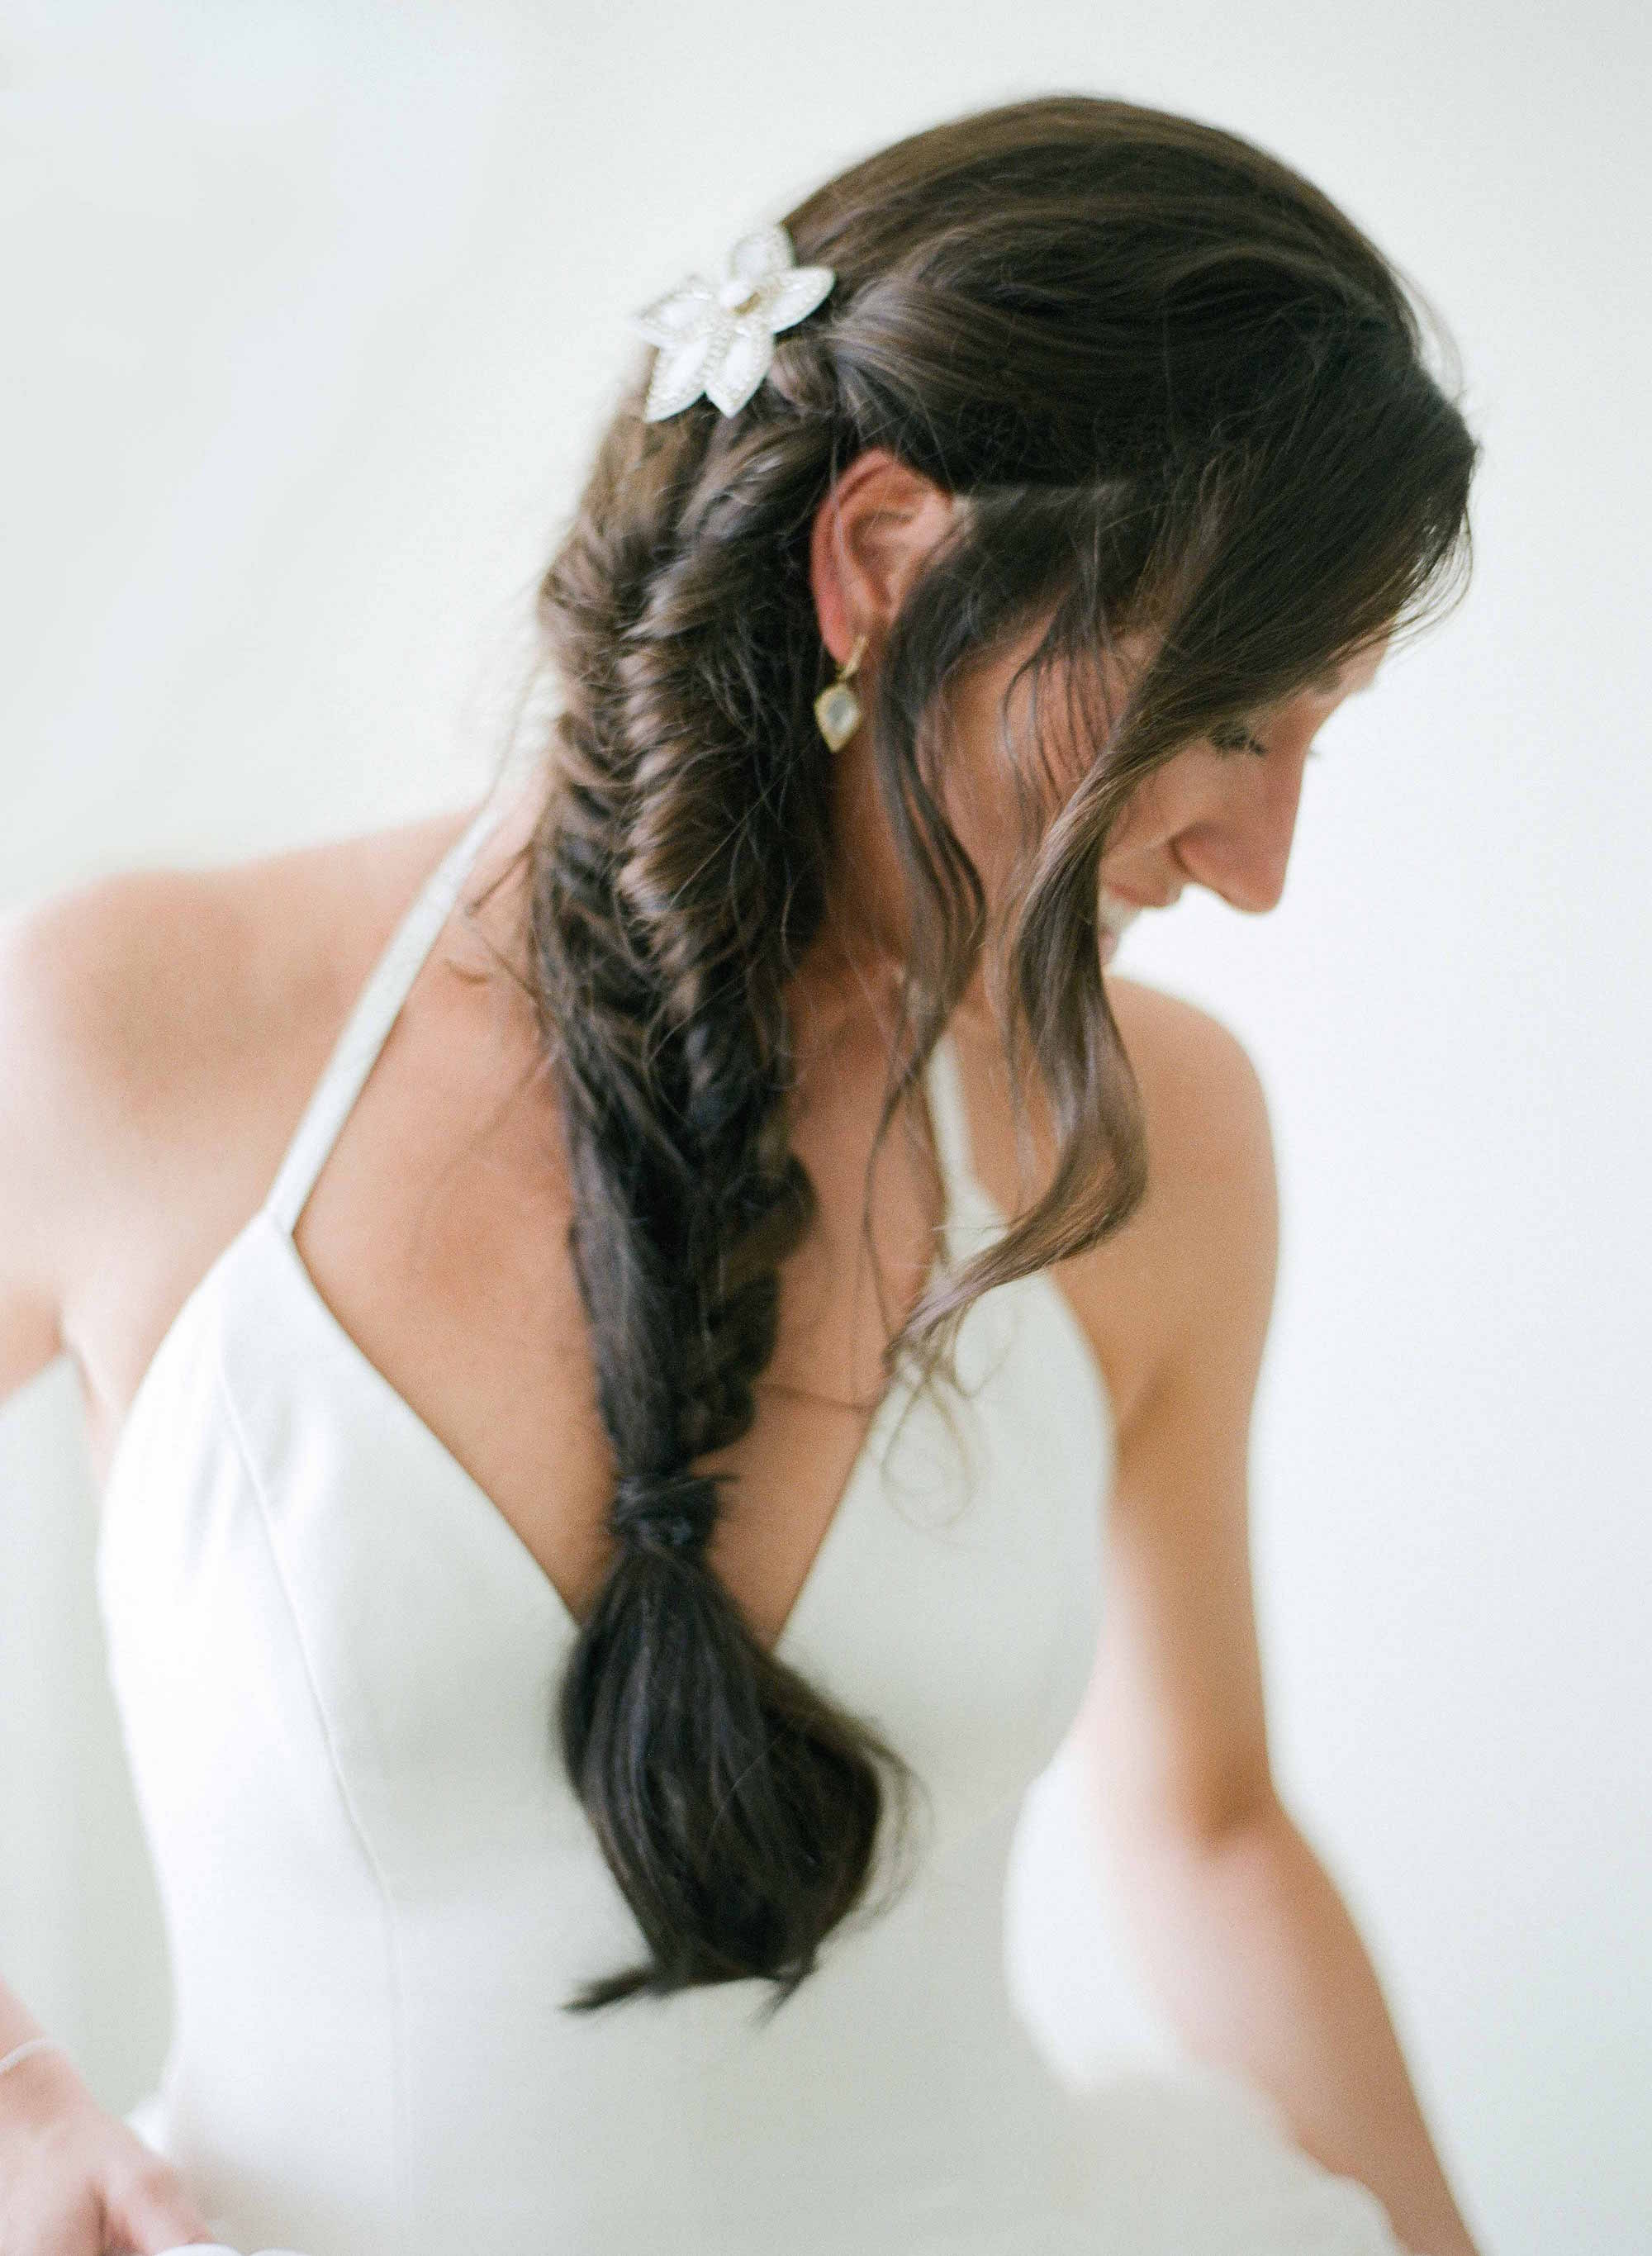 steven yeun wedding, joana pak bridal hair inspiration, long fishtail braid